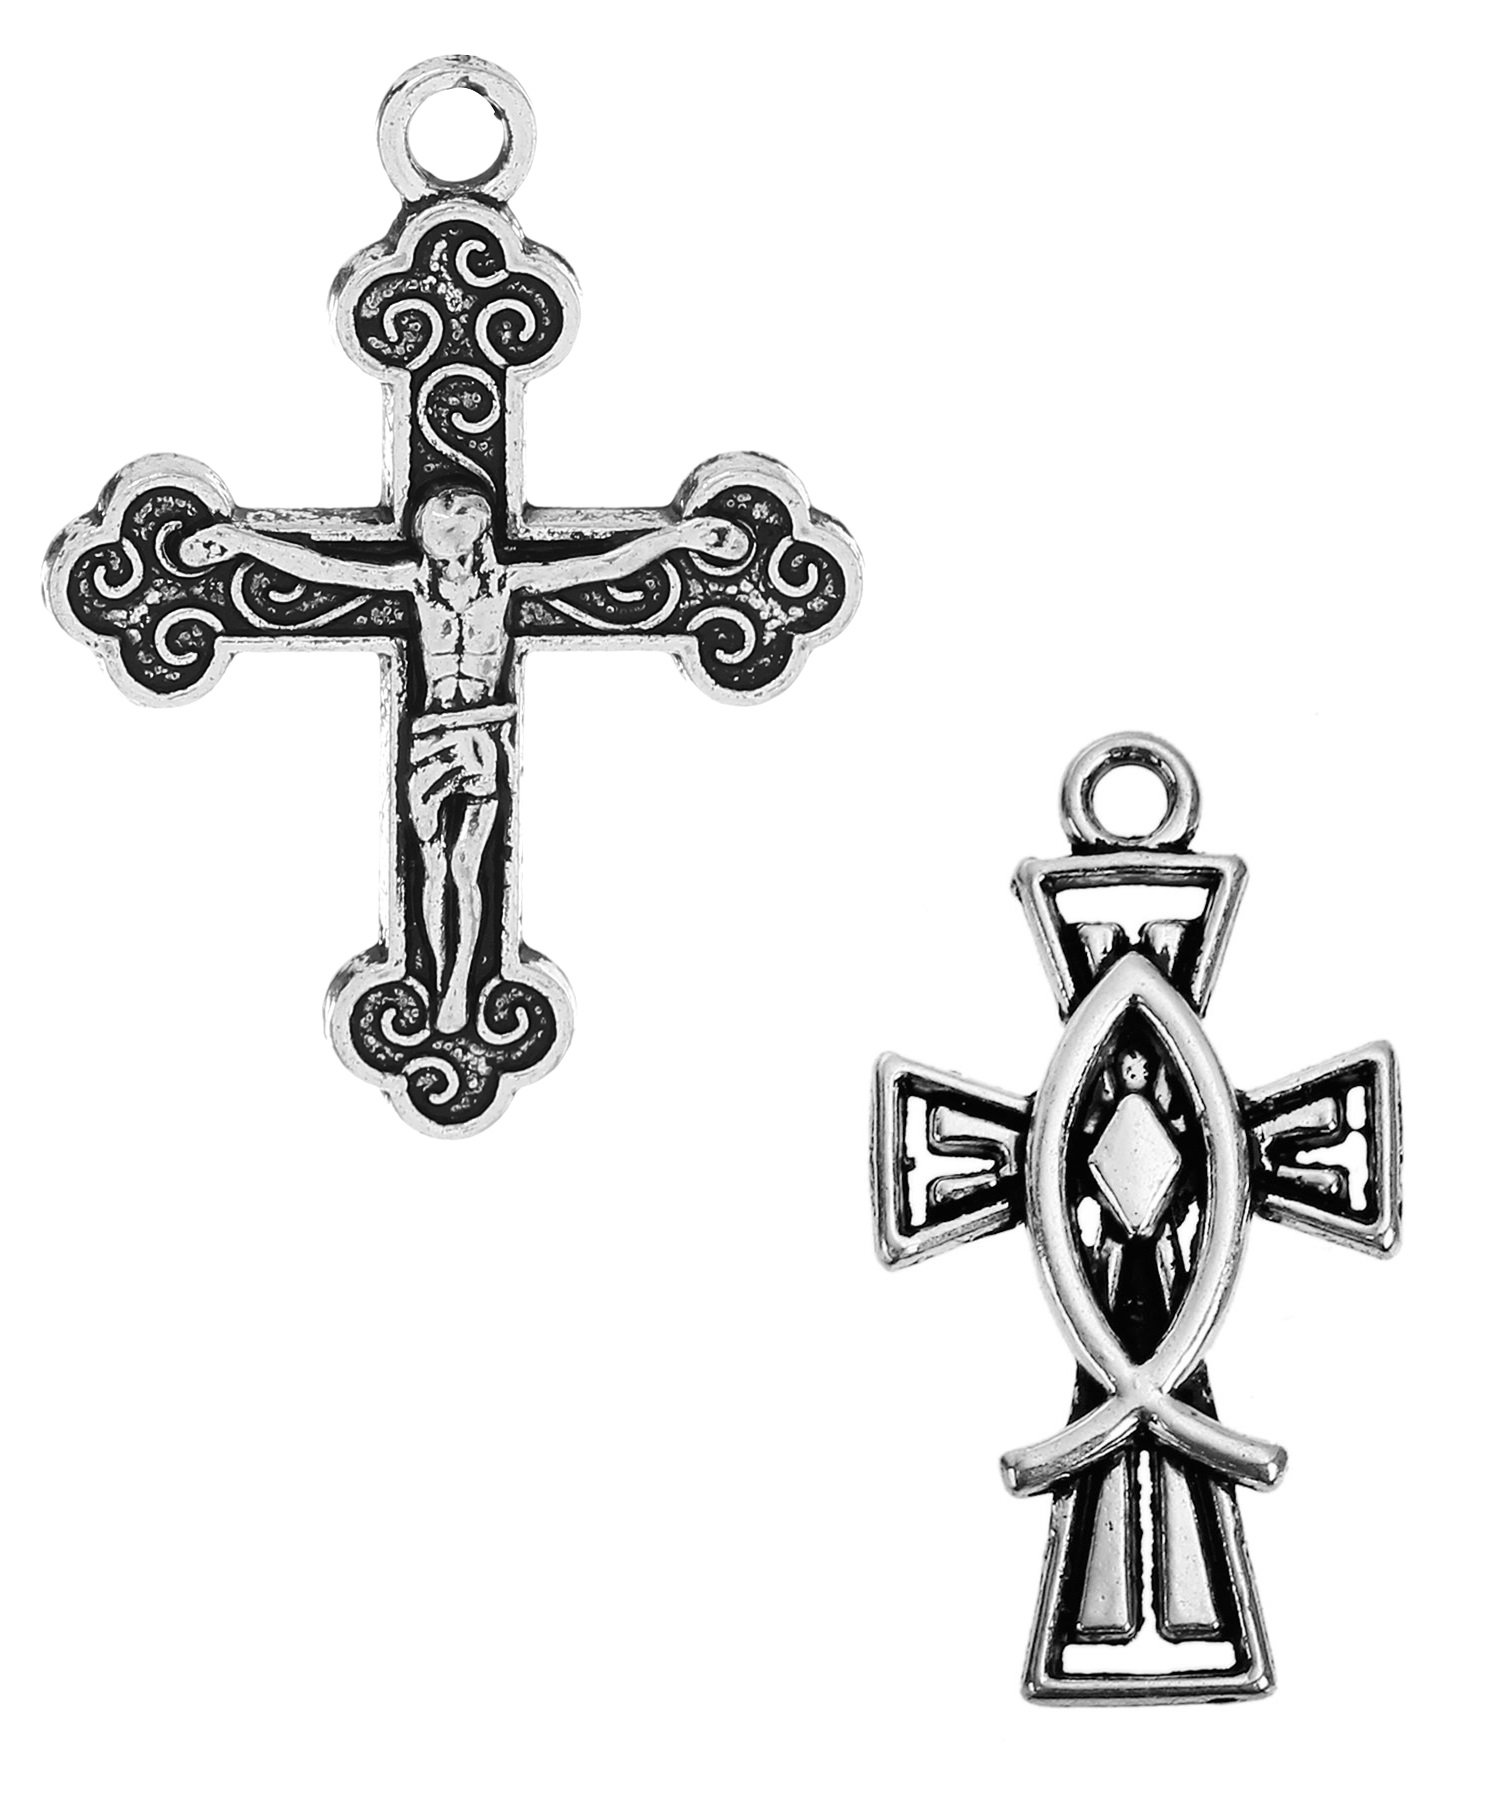 Cross Crucifix Charm Pendants, 100 Pack (50 of Each) (Set 1)